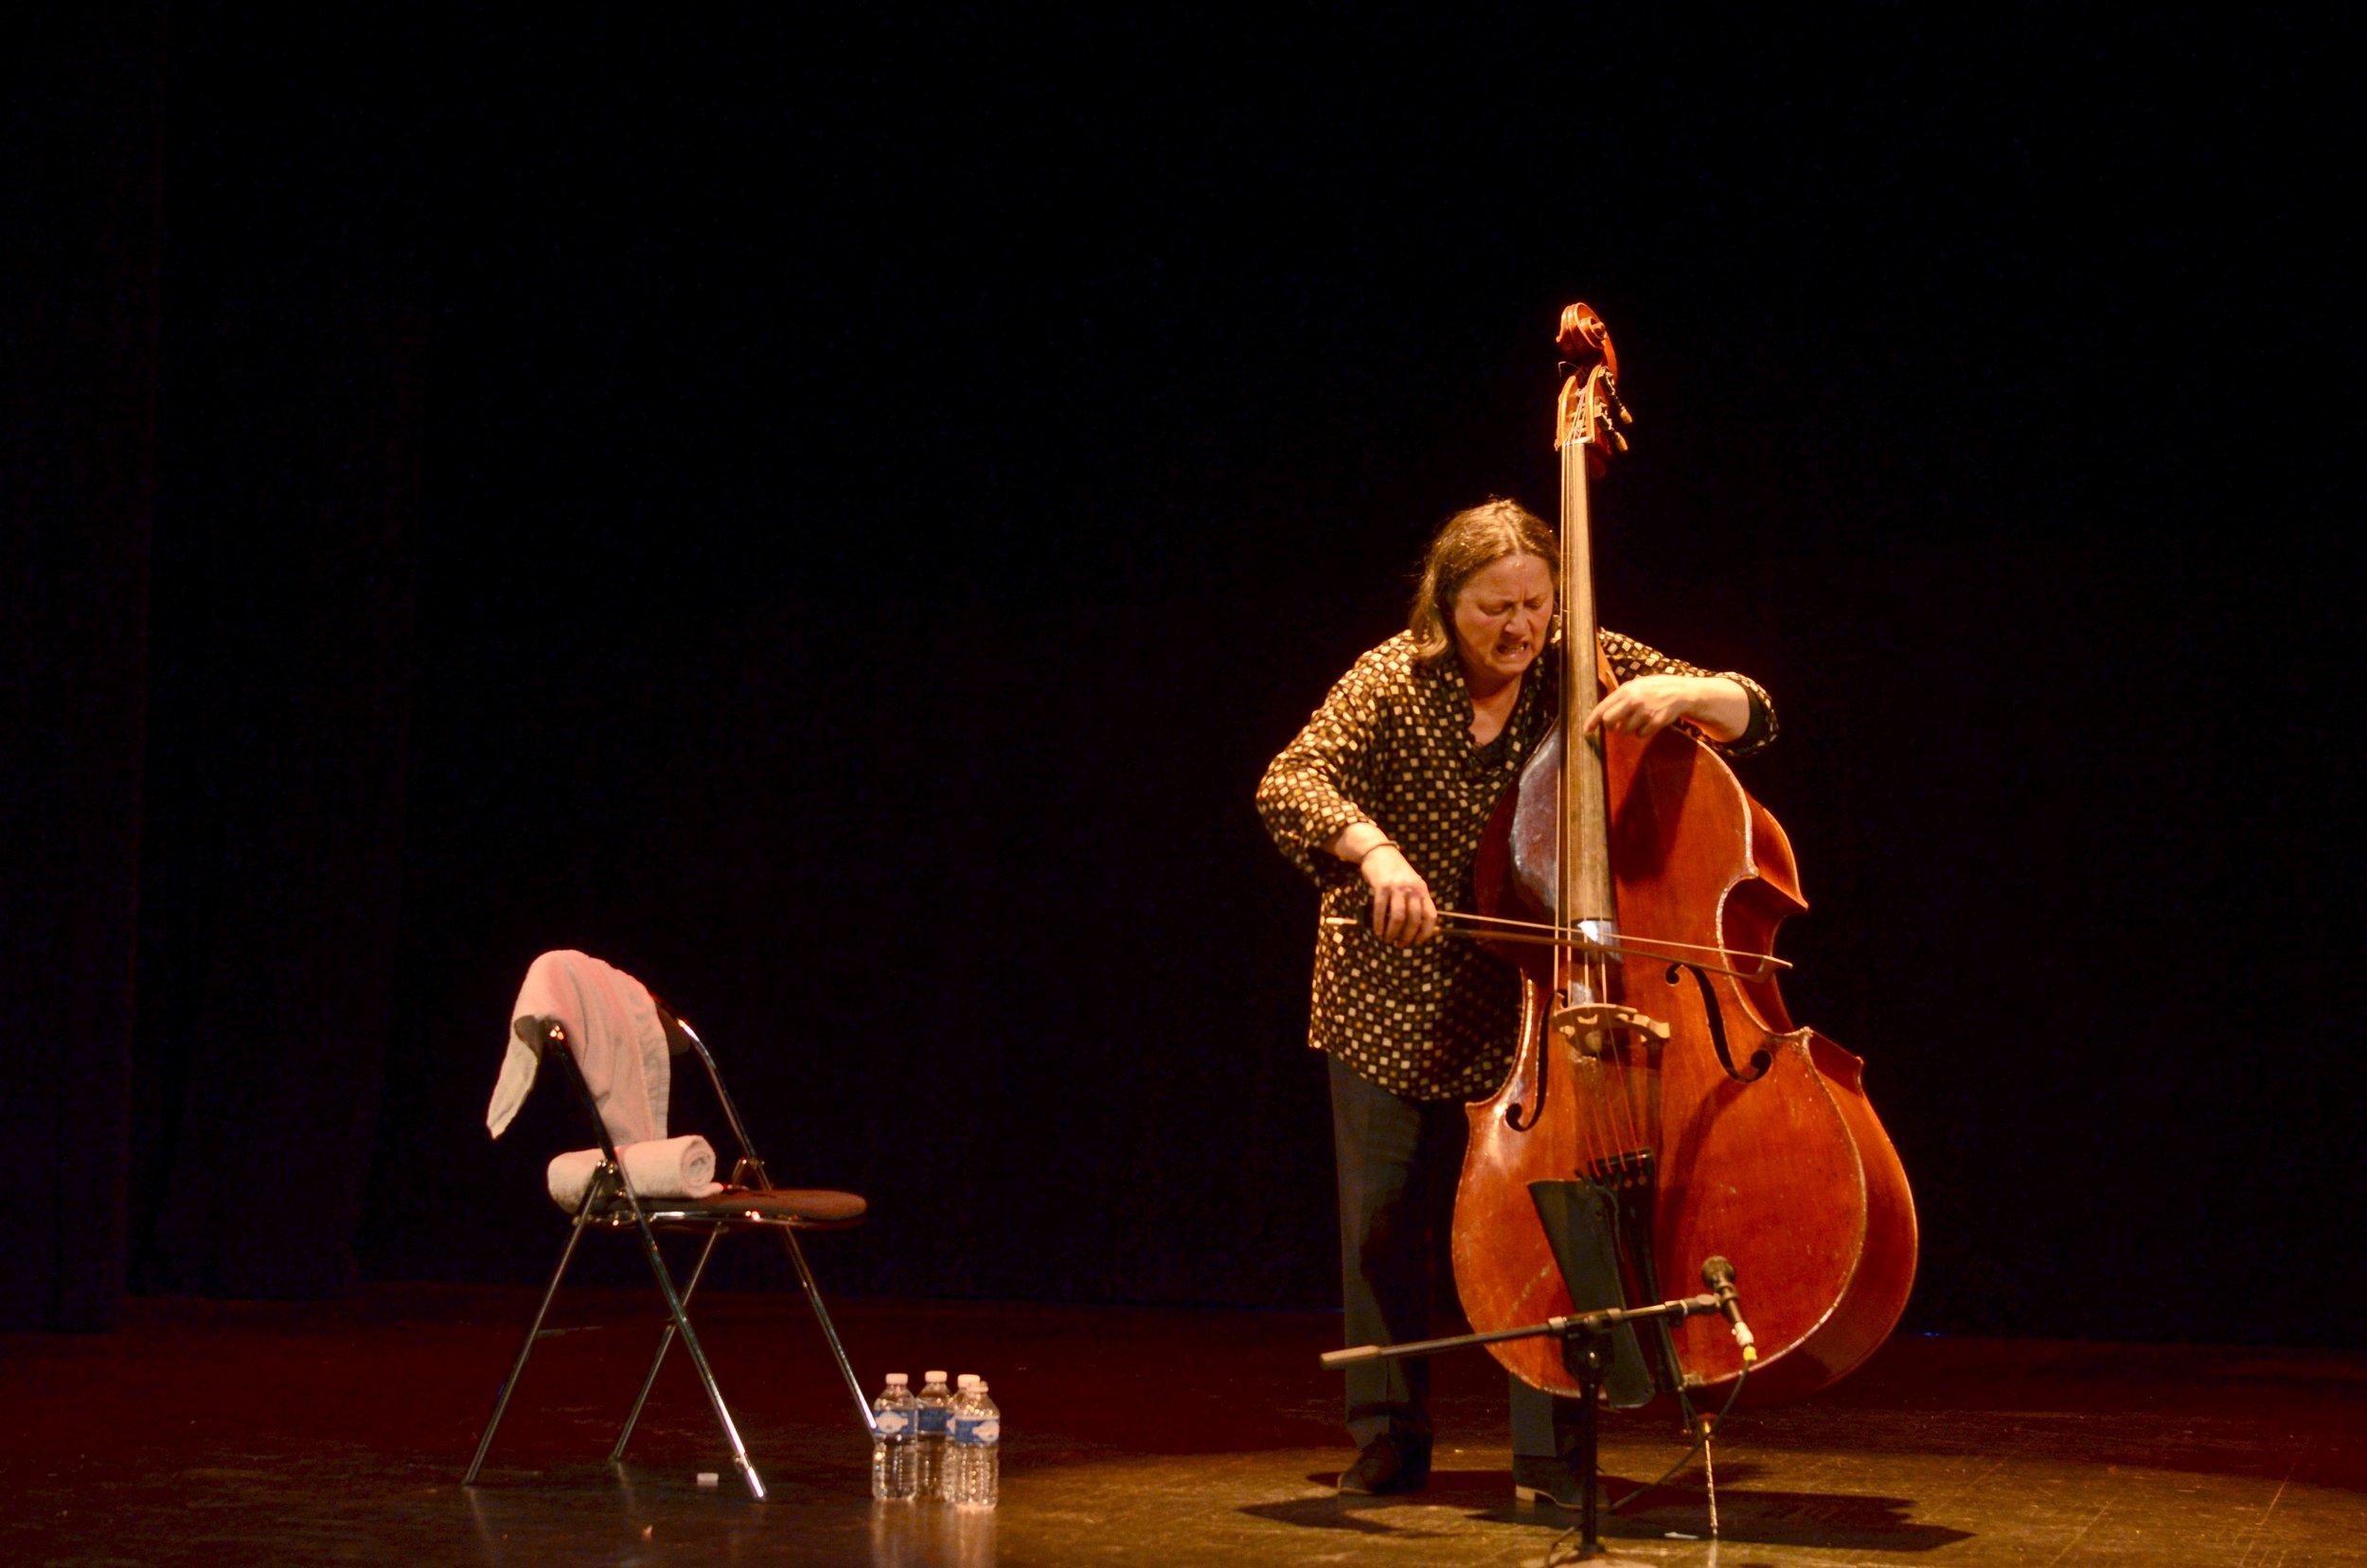 Foto:Joëlle Léandre på Jazz à L'Étage #3  ( Jean-Daniel Pauget ,  CC BY 2.0 )